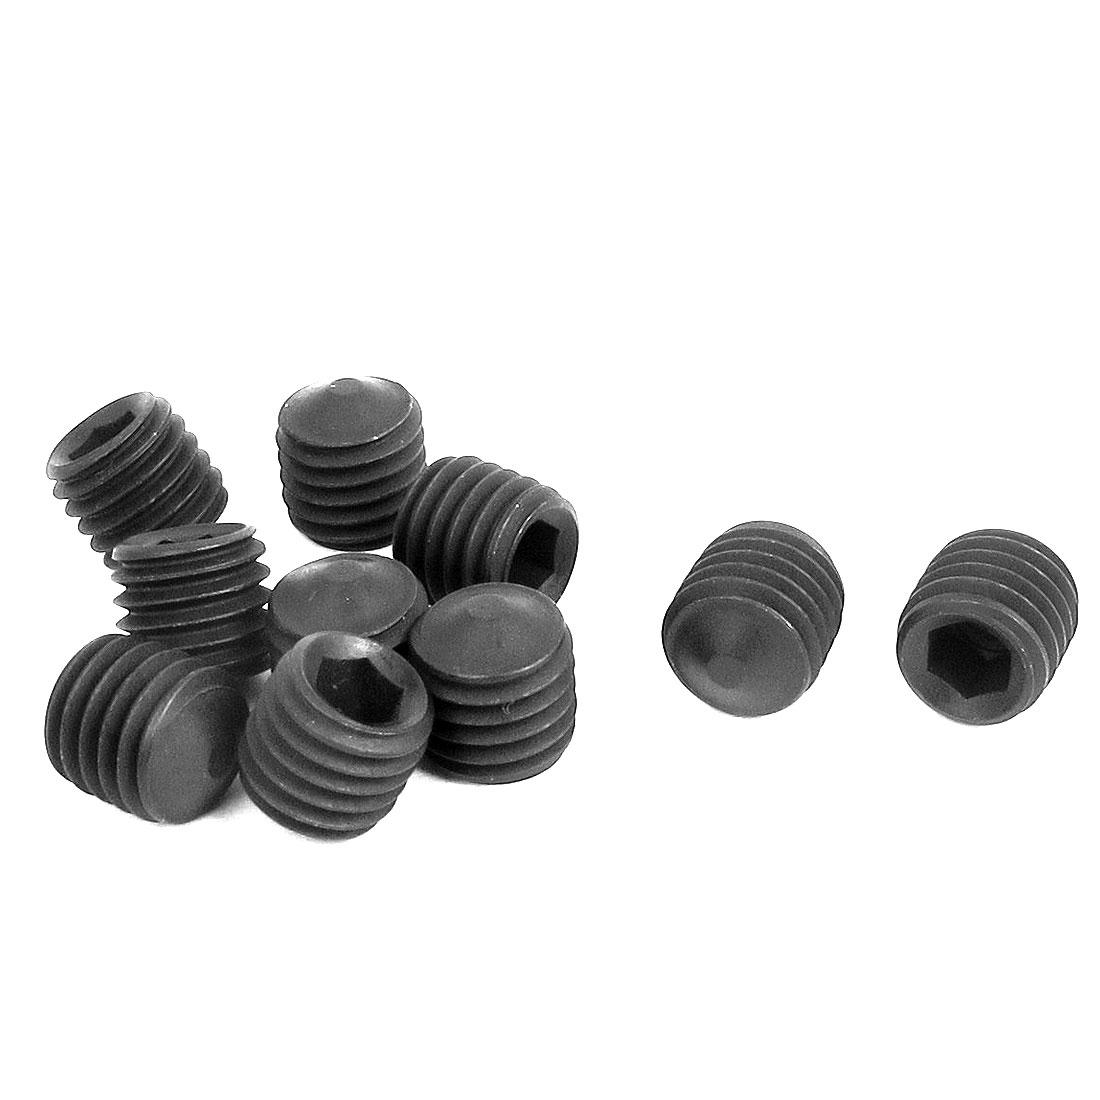 M12x12mm 1.75mm Pitch 12.9 Alloy Steel Hex Socket Set Cone Point Grub Screws 10pcs